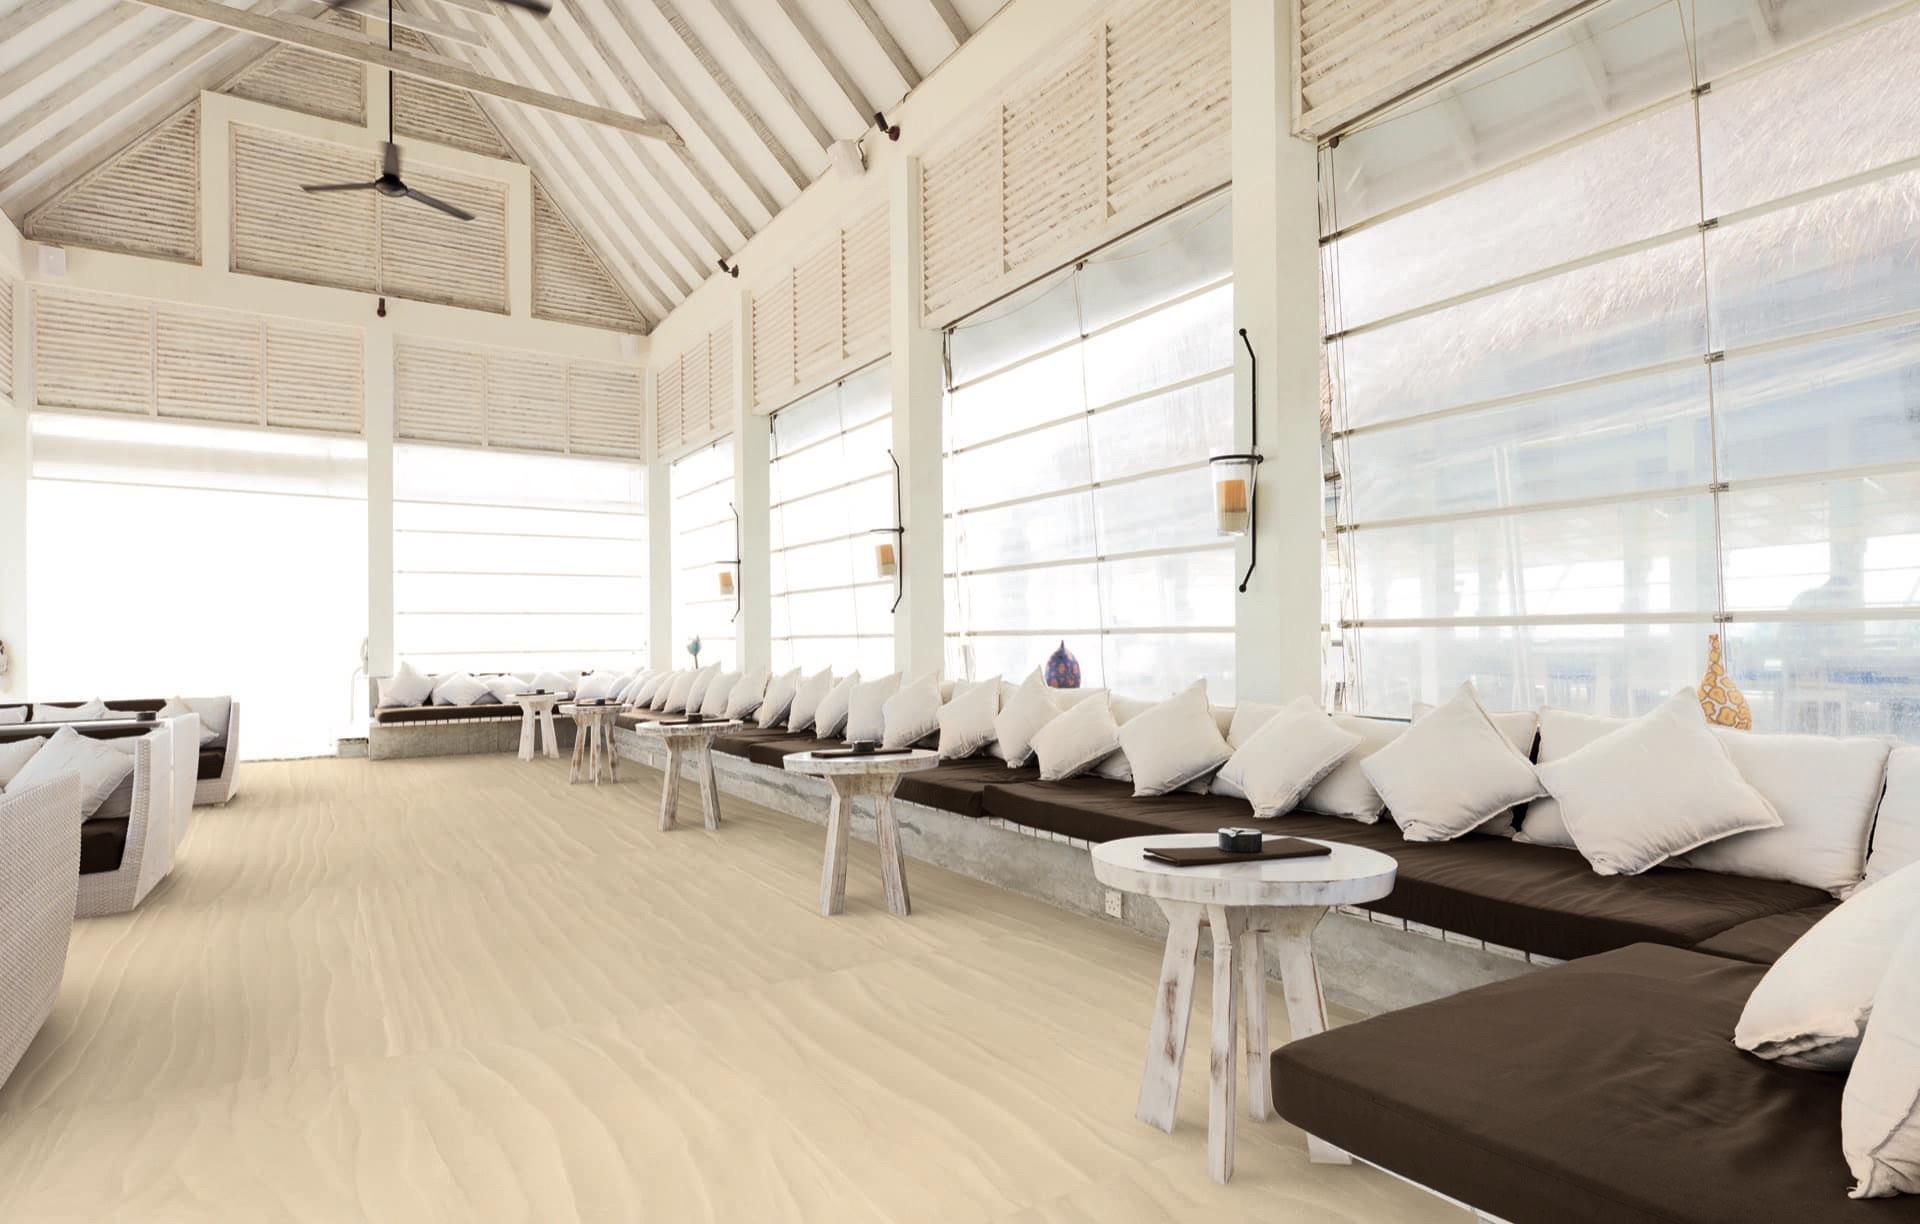 Zerodesign Thar Beige Naturale 60x120 Amb Lounge